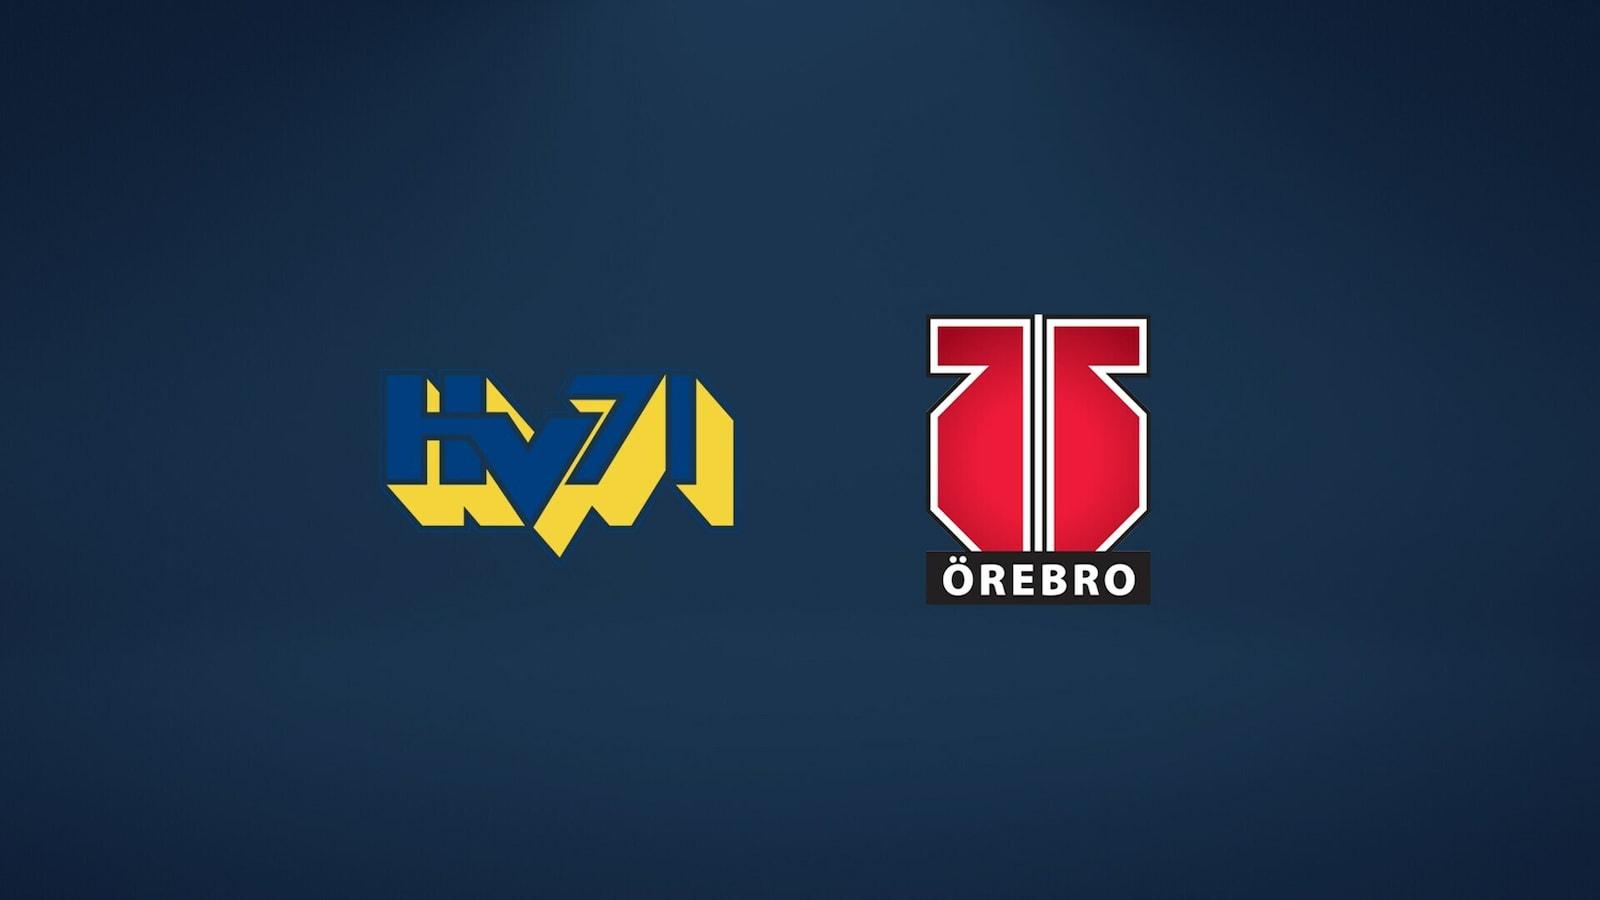 HV71 - Örebro